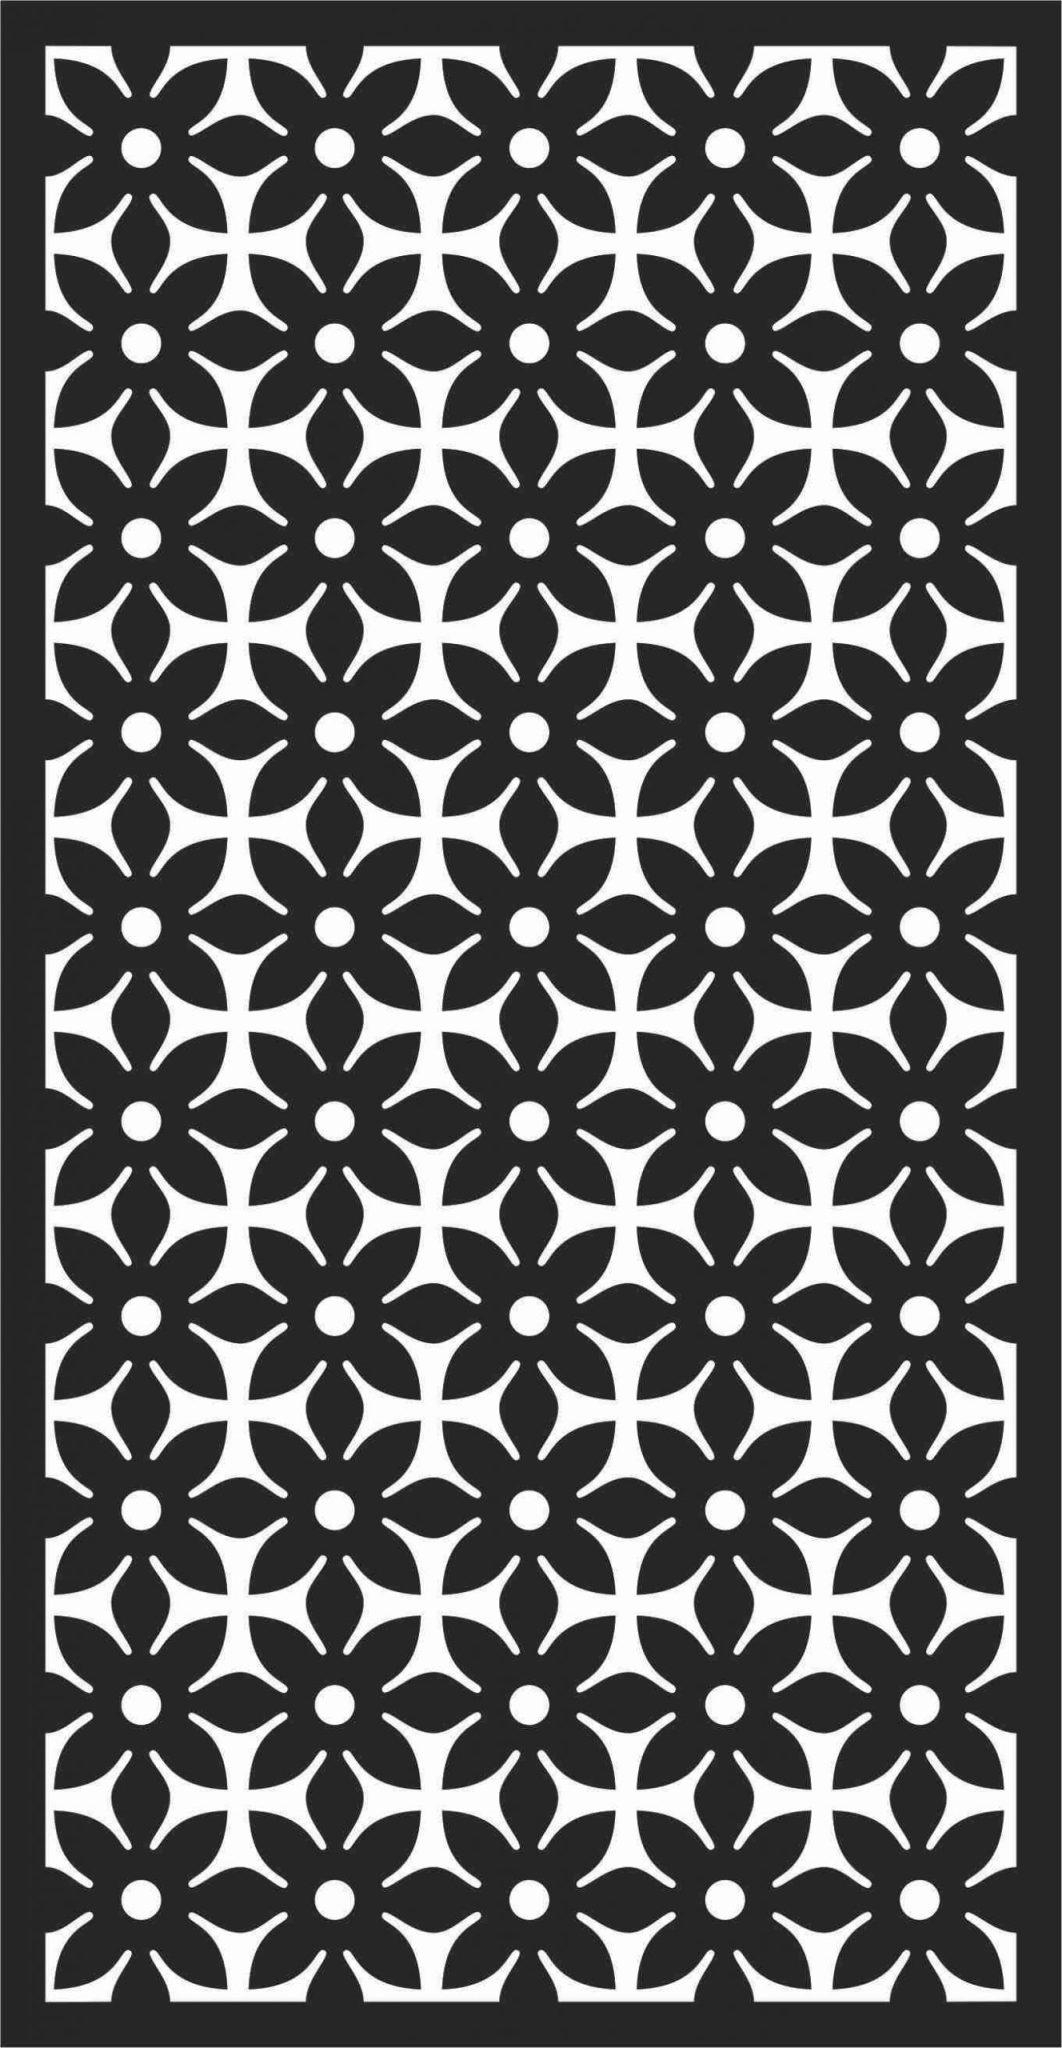 Screen Panel Patterns Seamless 13 Free DXF File